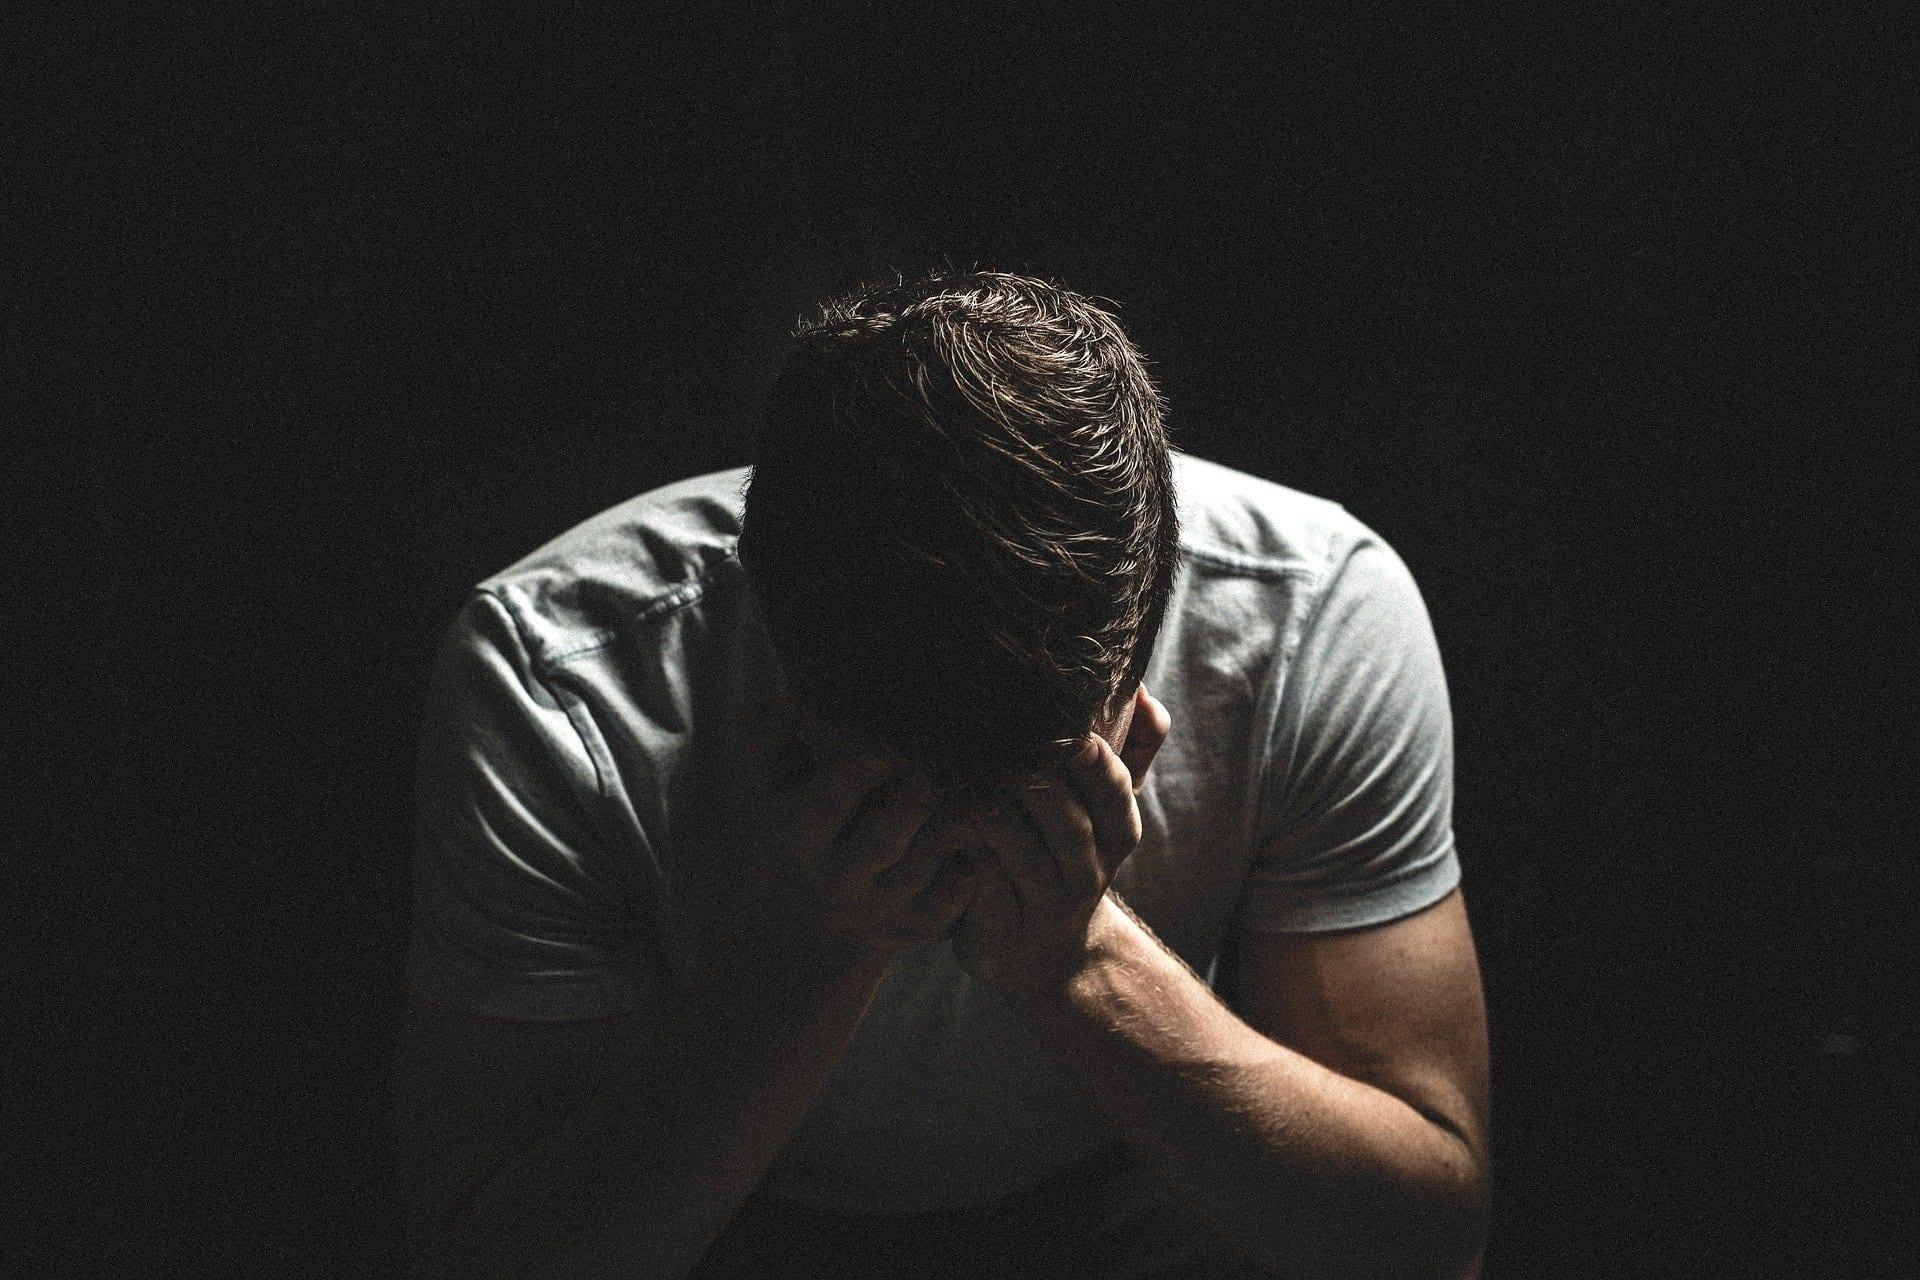 Divorce and addiction